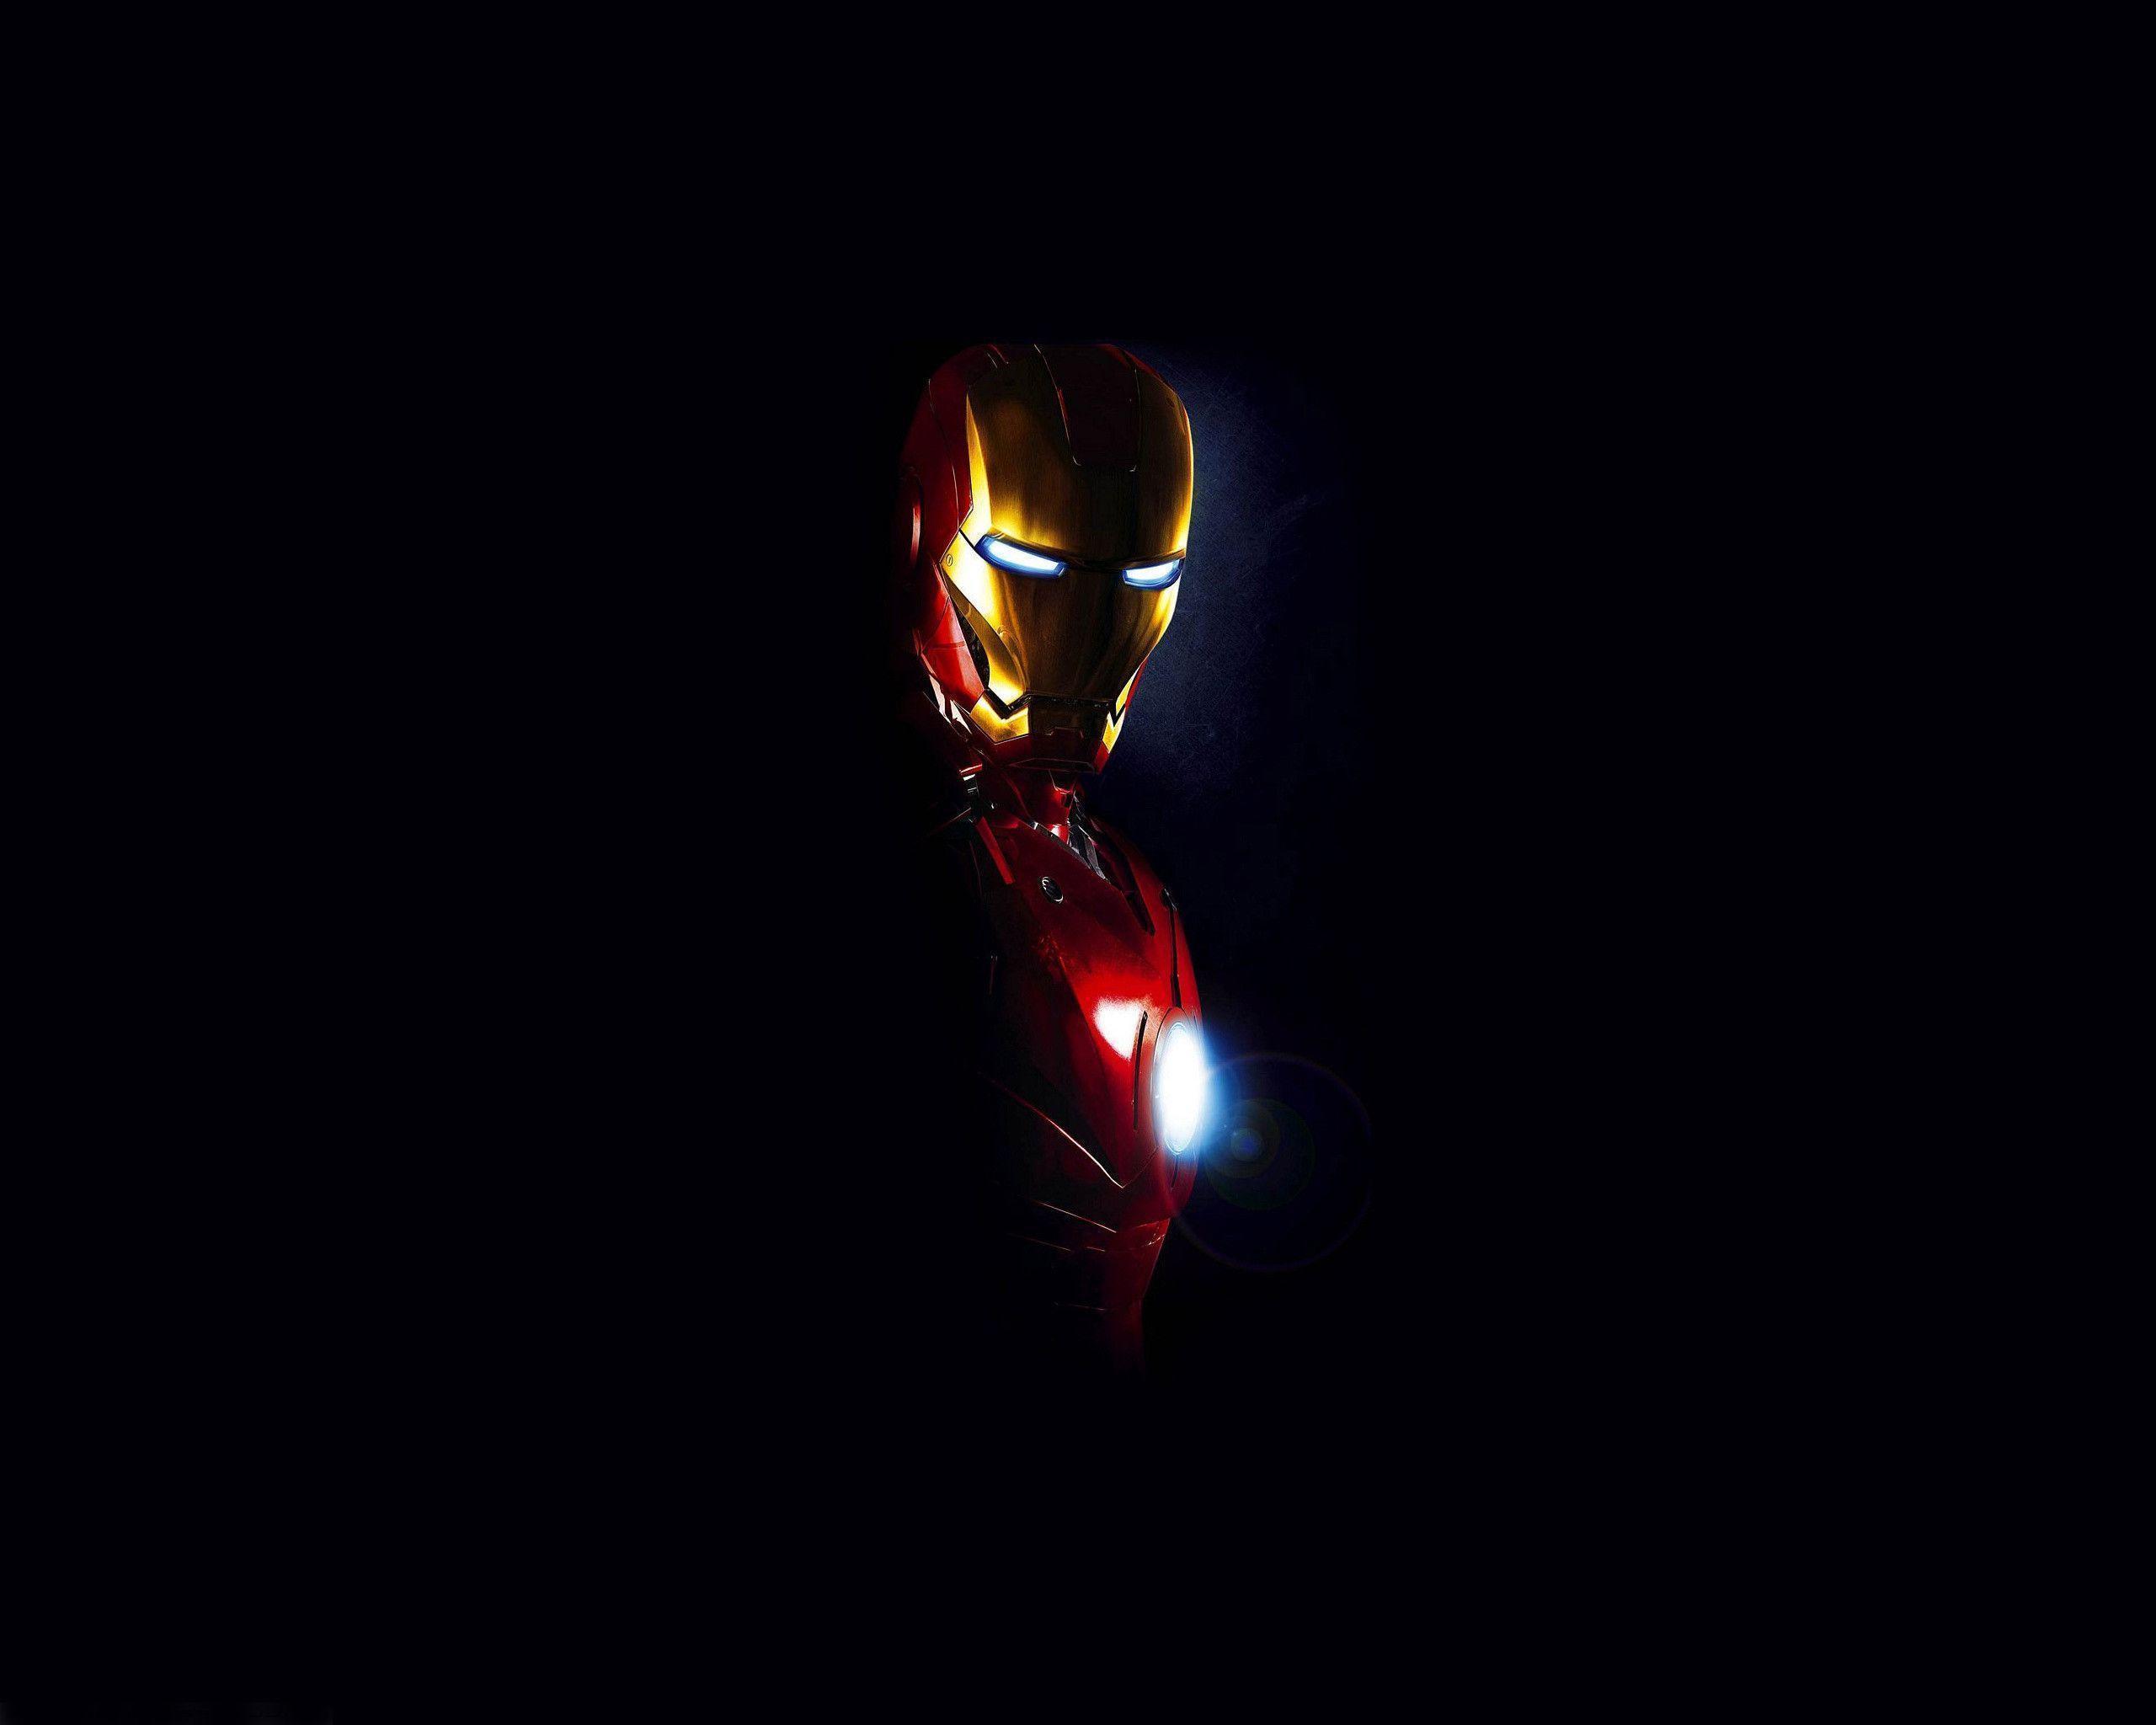 Iron Man 3 Hd Wallpapers For Desktop Wallpaper | HDMarvelWallpaper